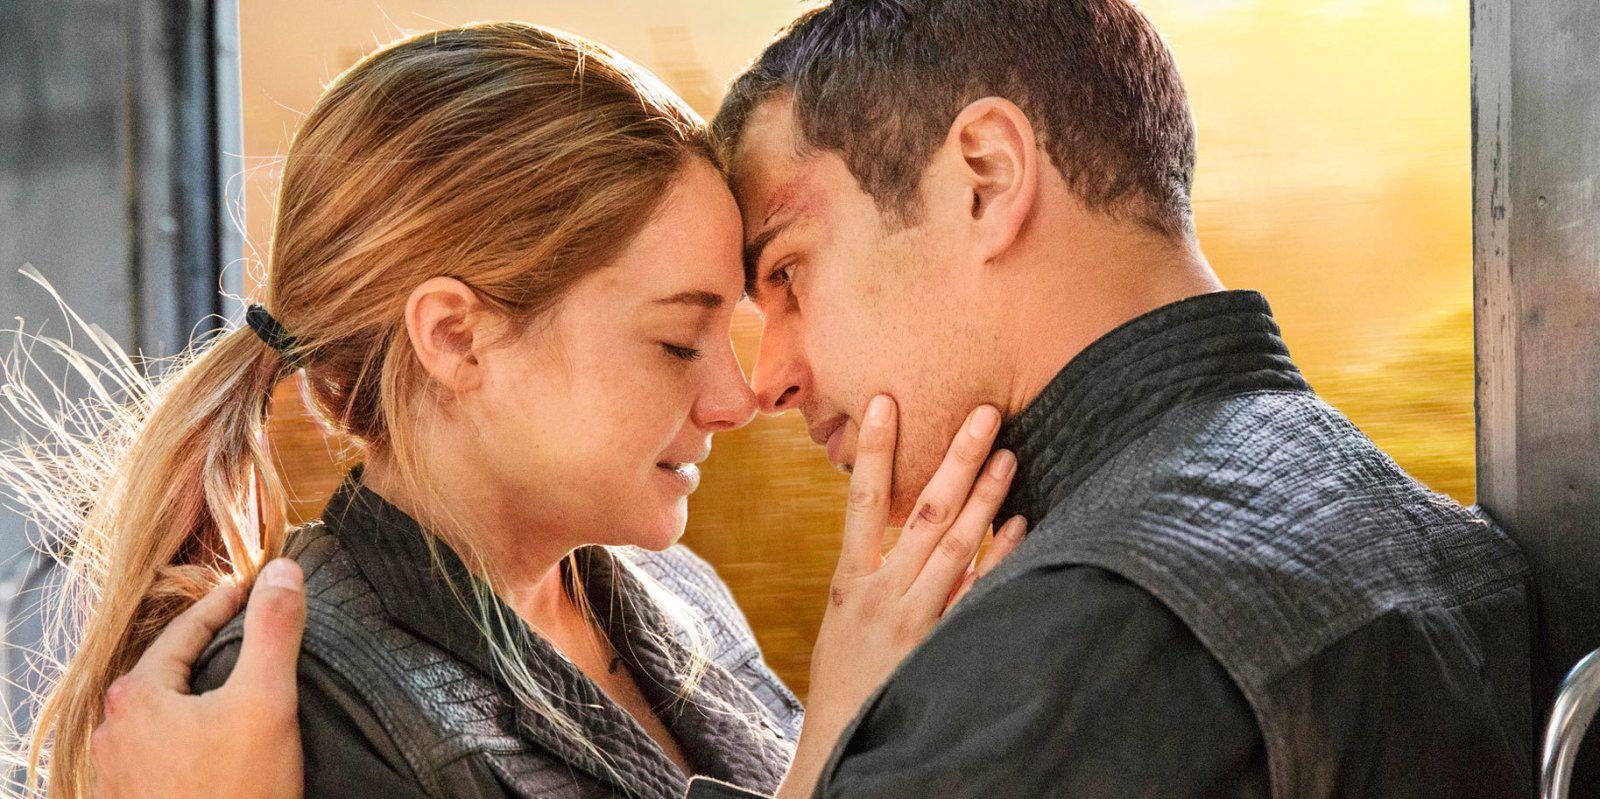 Divergent four under simulation dating